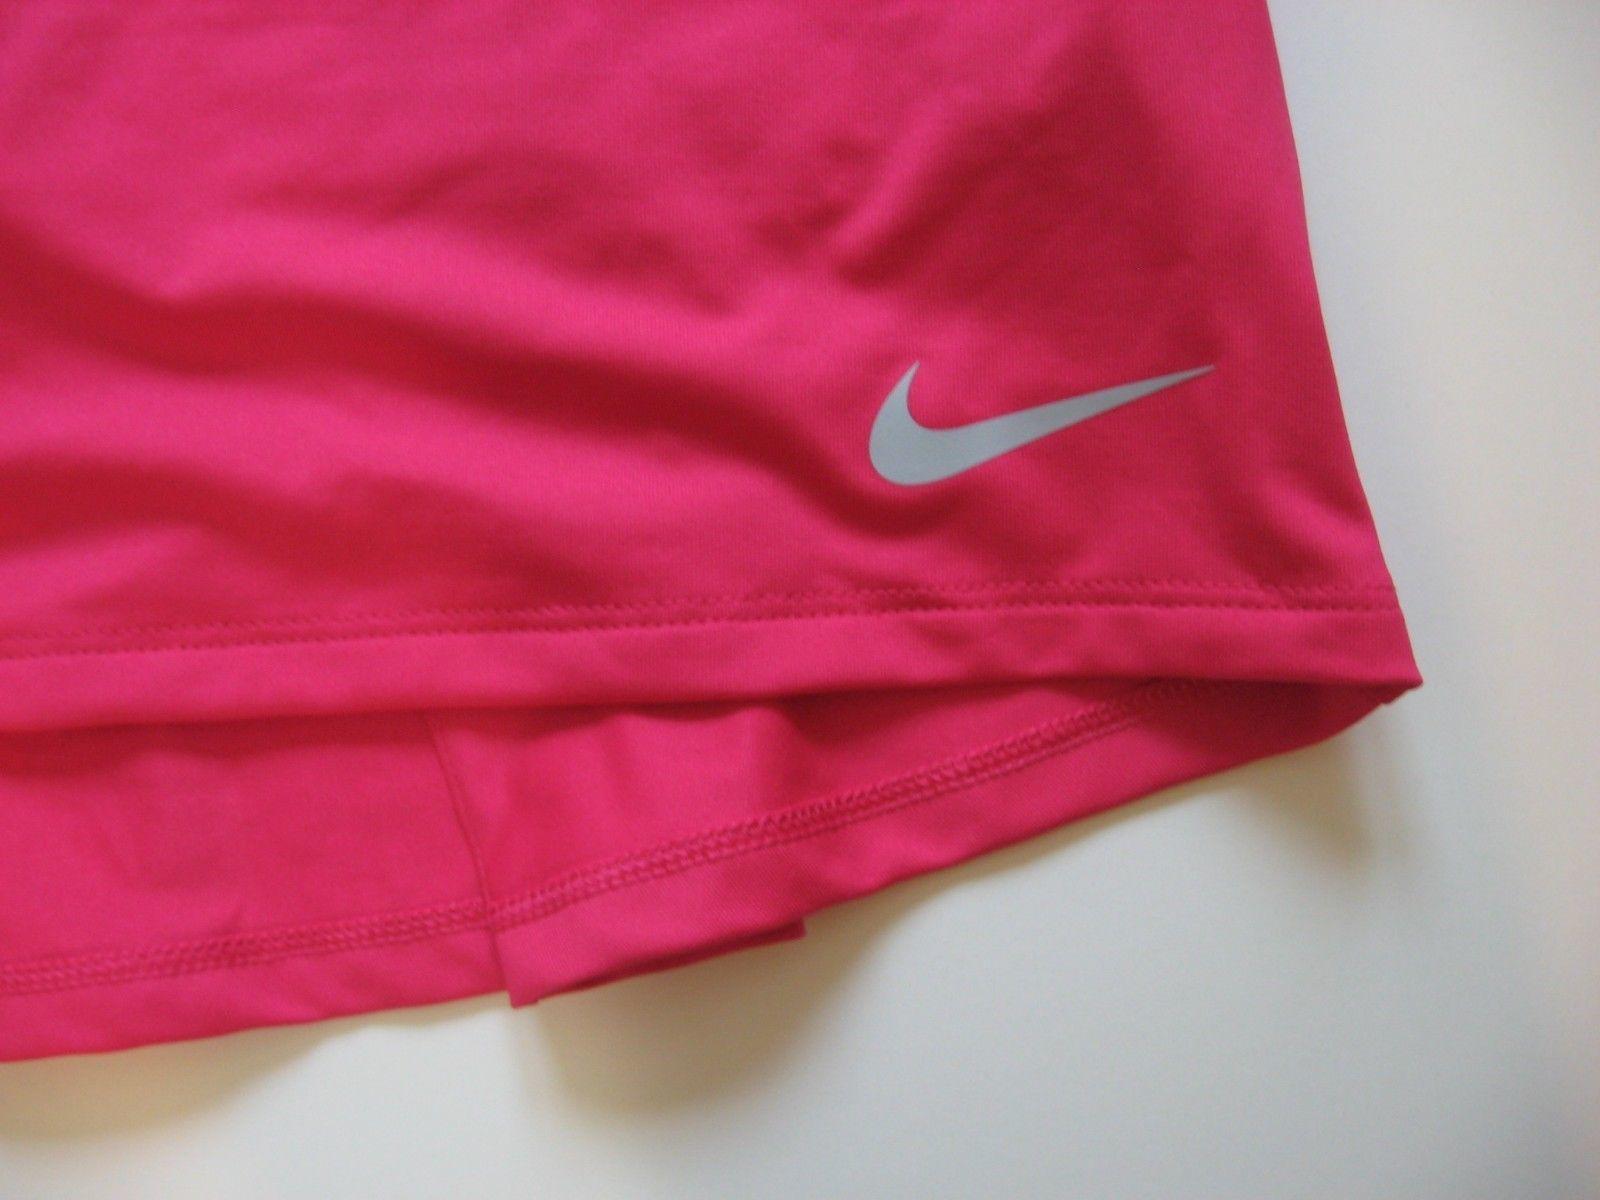 "New Nike Dry Womens Standard Fit 15"" Skirt Skort Pink 884894-666 Size S"